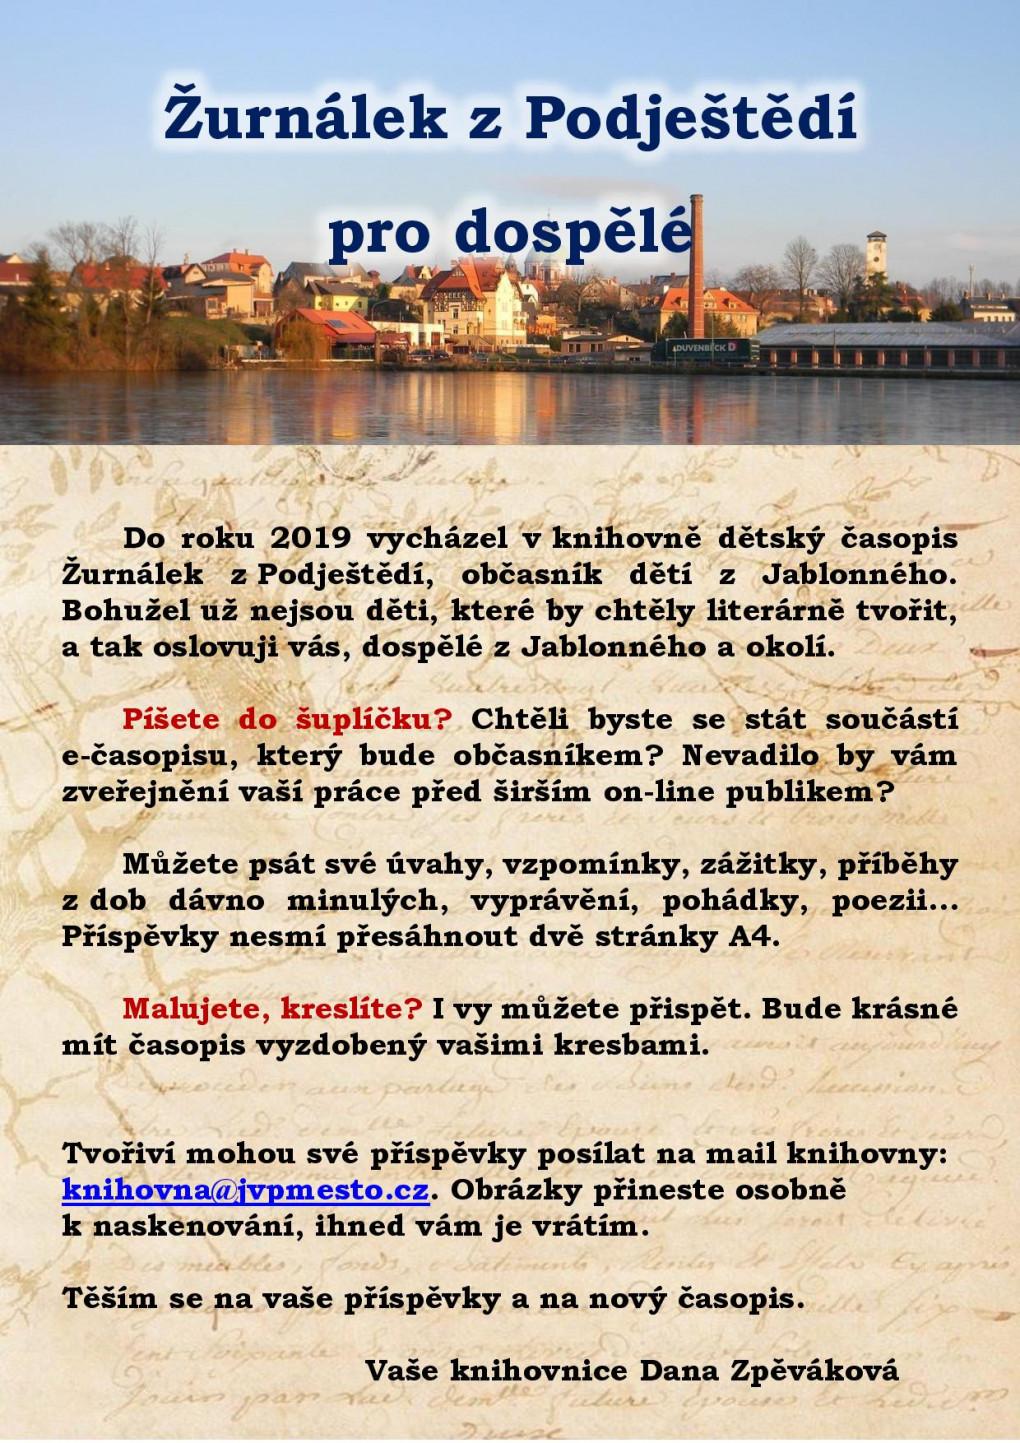 urnalek_pro_dospele-page-001.jpg